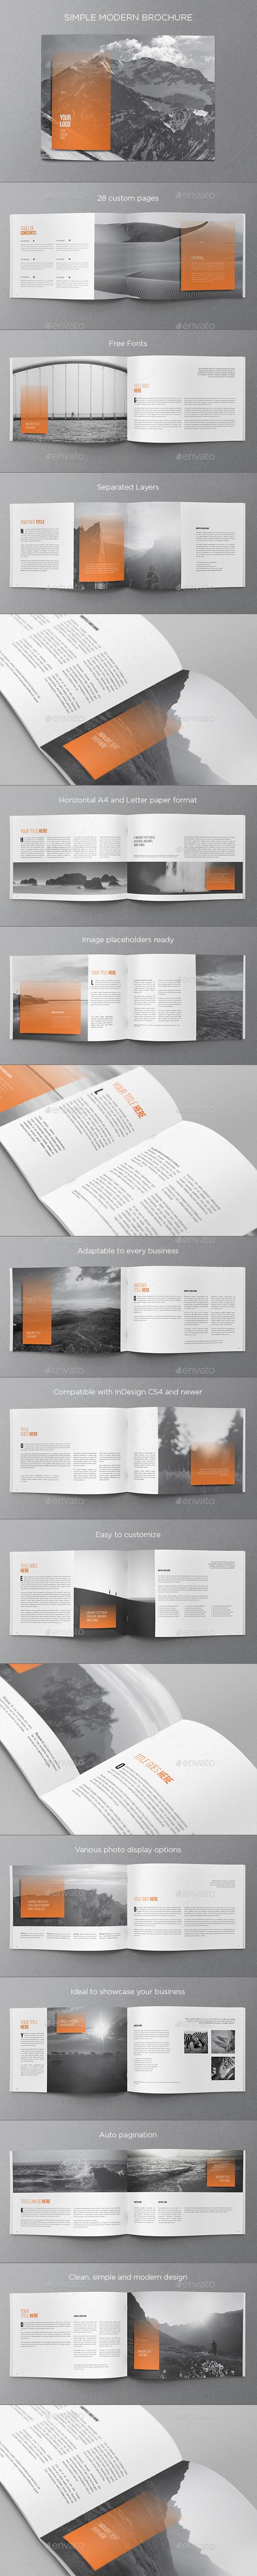 Simple Modern Brochure - Brochures Print Templates